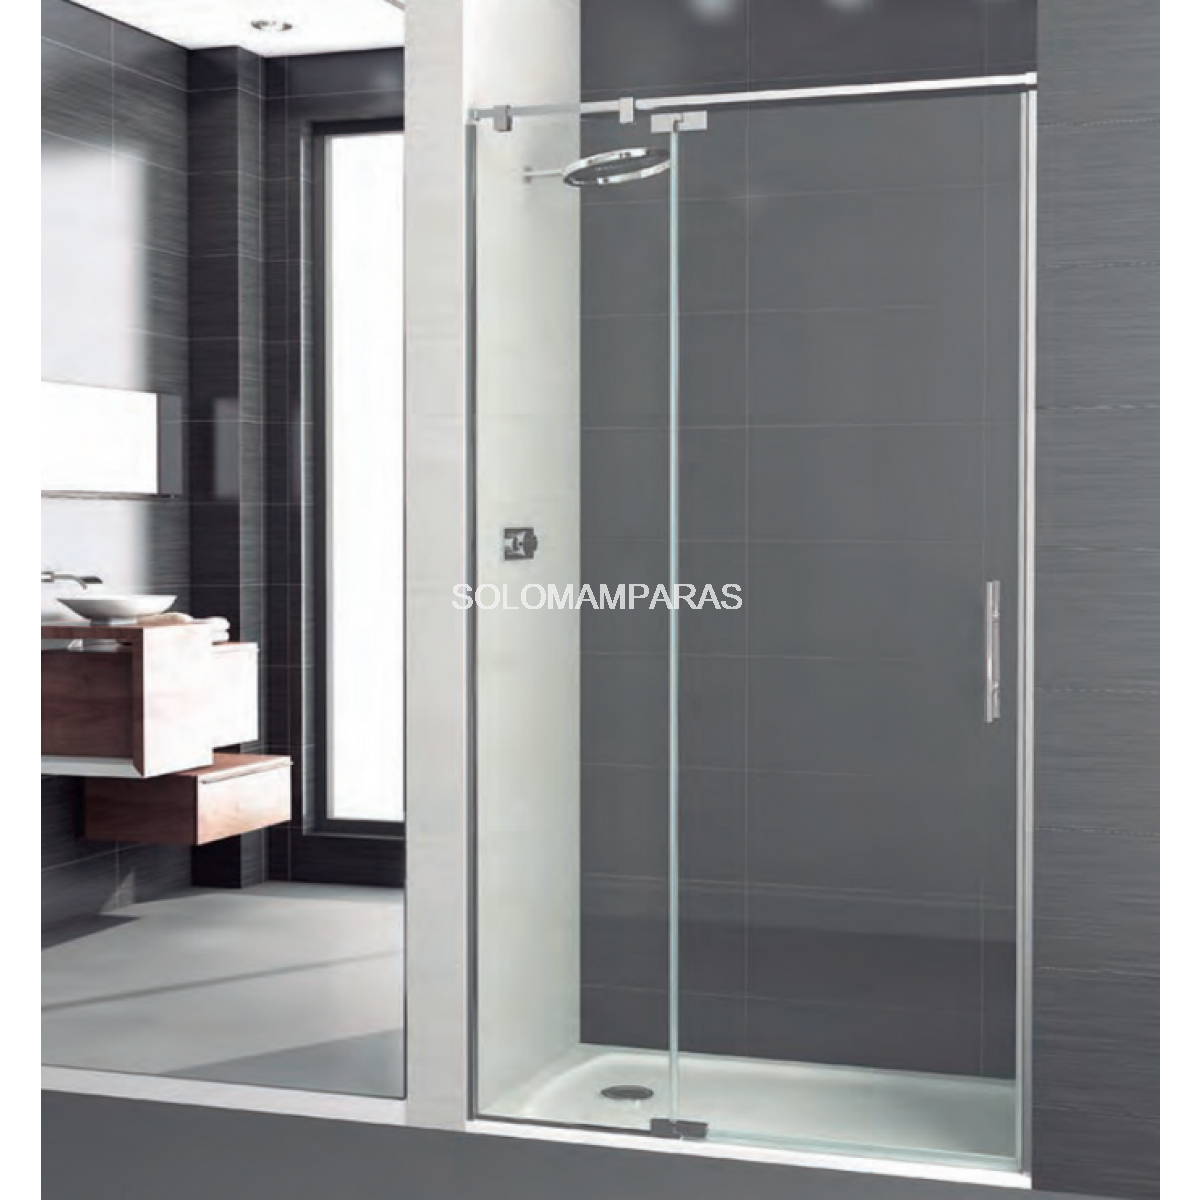 Mampara de ducha polary articulada deyban 1 fijo 1 for Mampara ducha fijo abatible